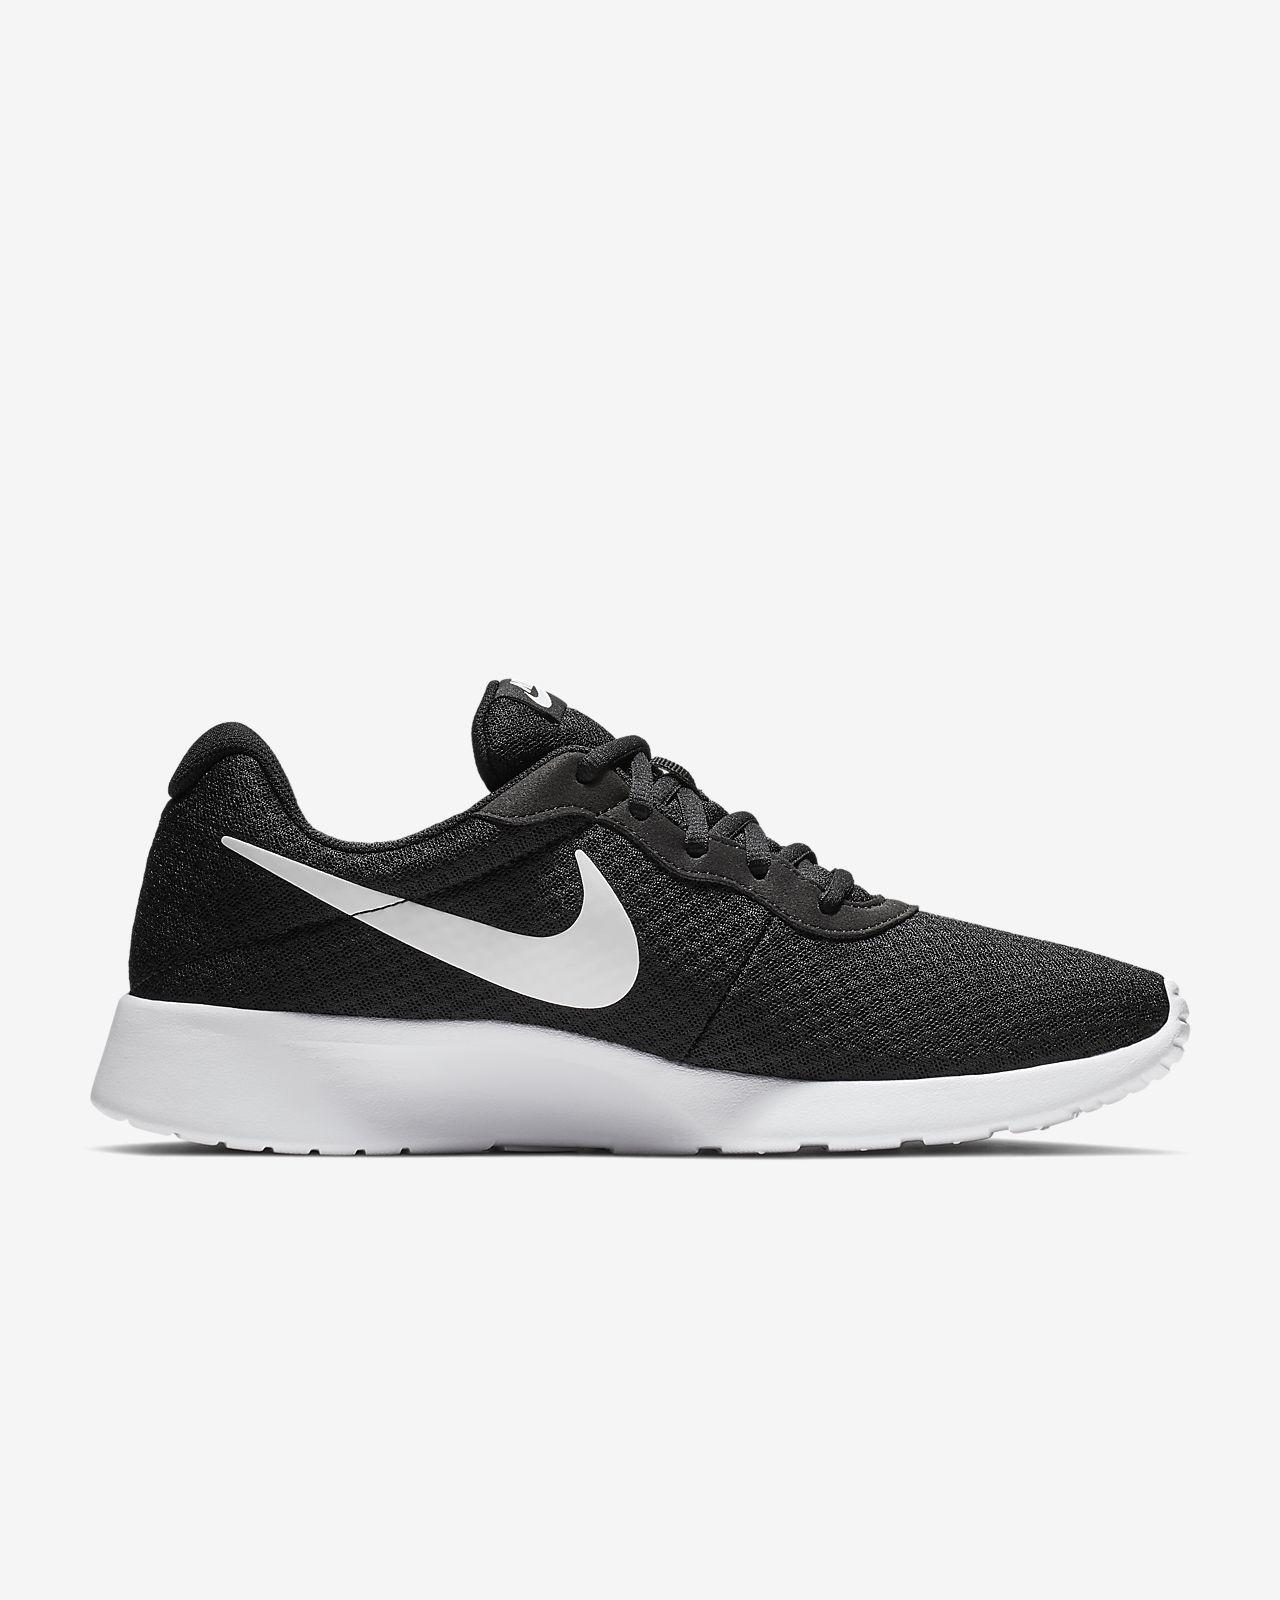 3f69be49b1163 Low Resolution Nike Tanjun Men s Shoe Nike Tanjun Men s Shoe